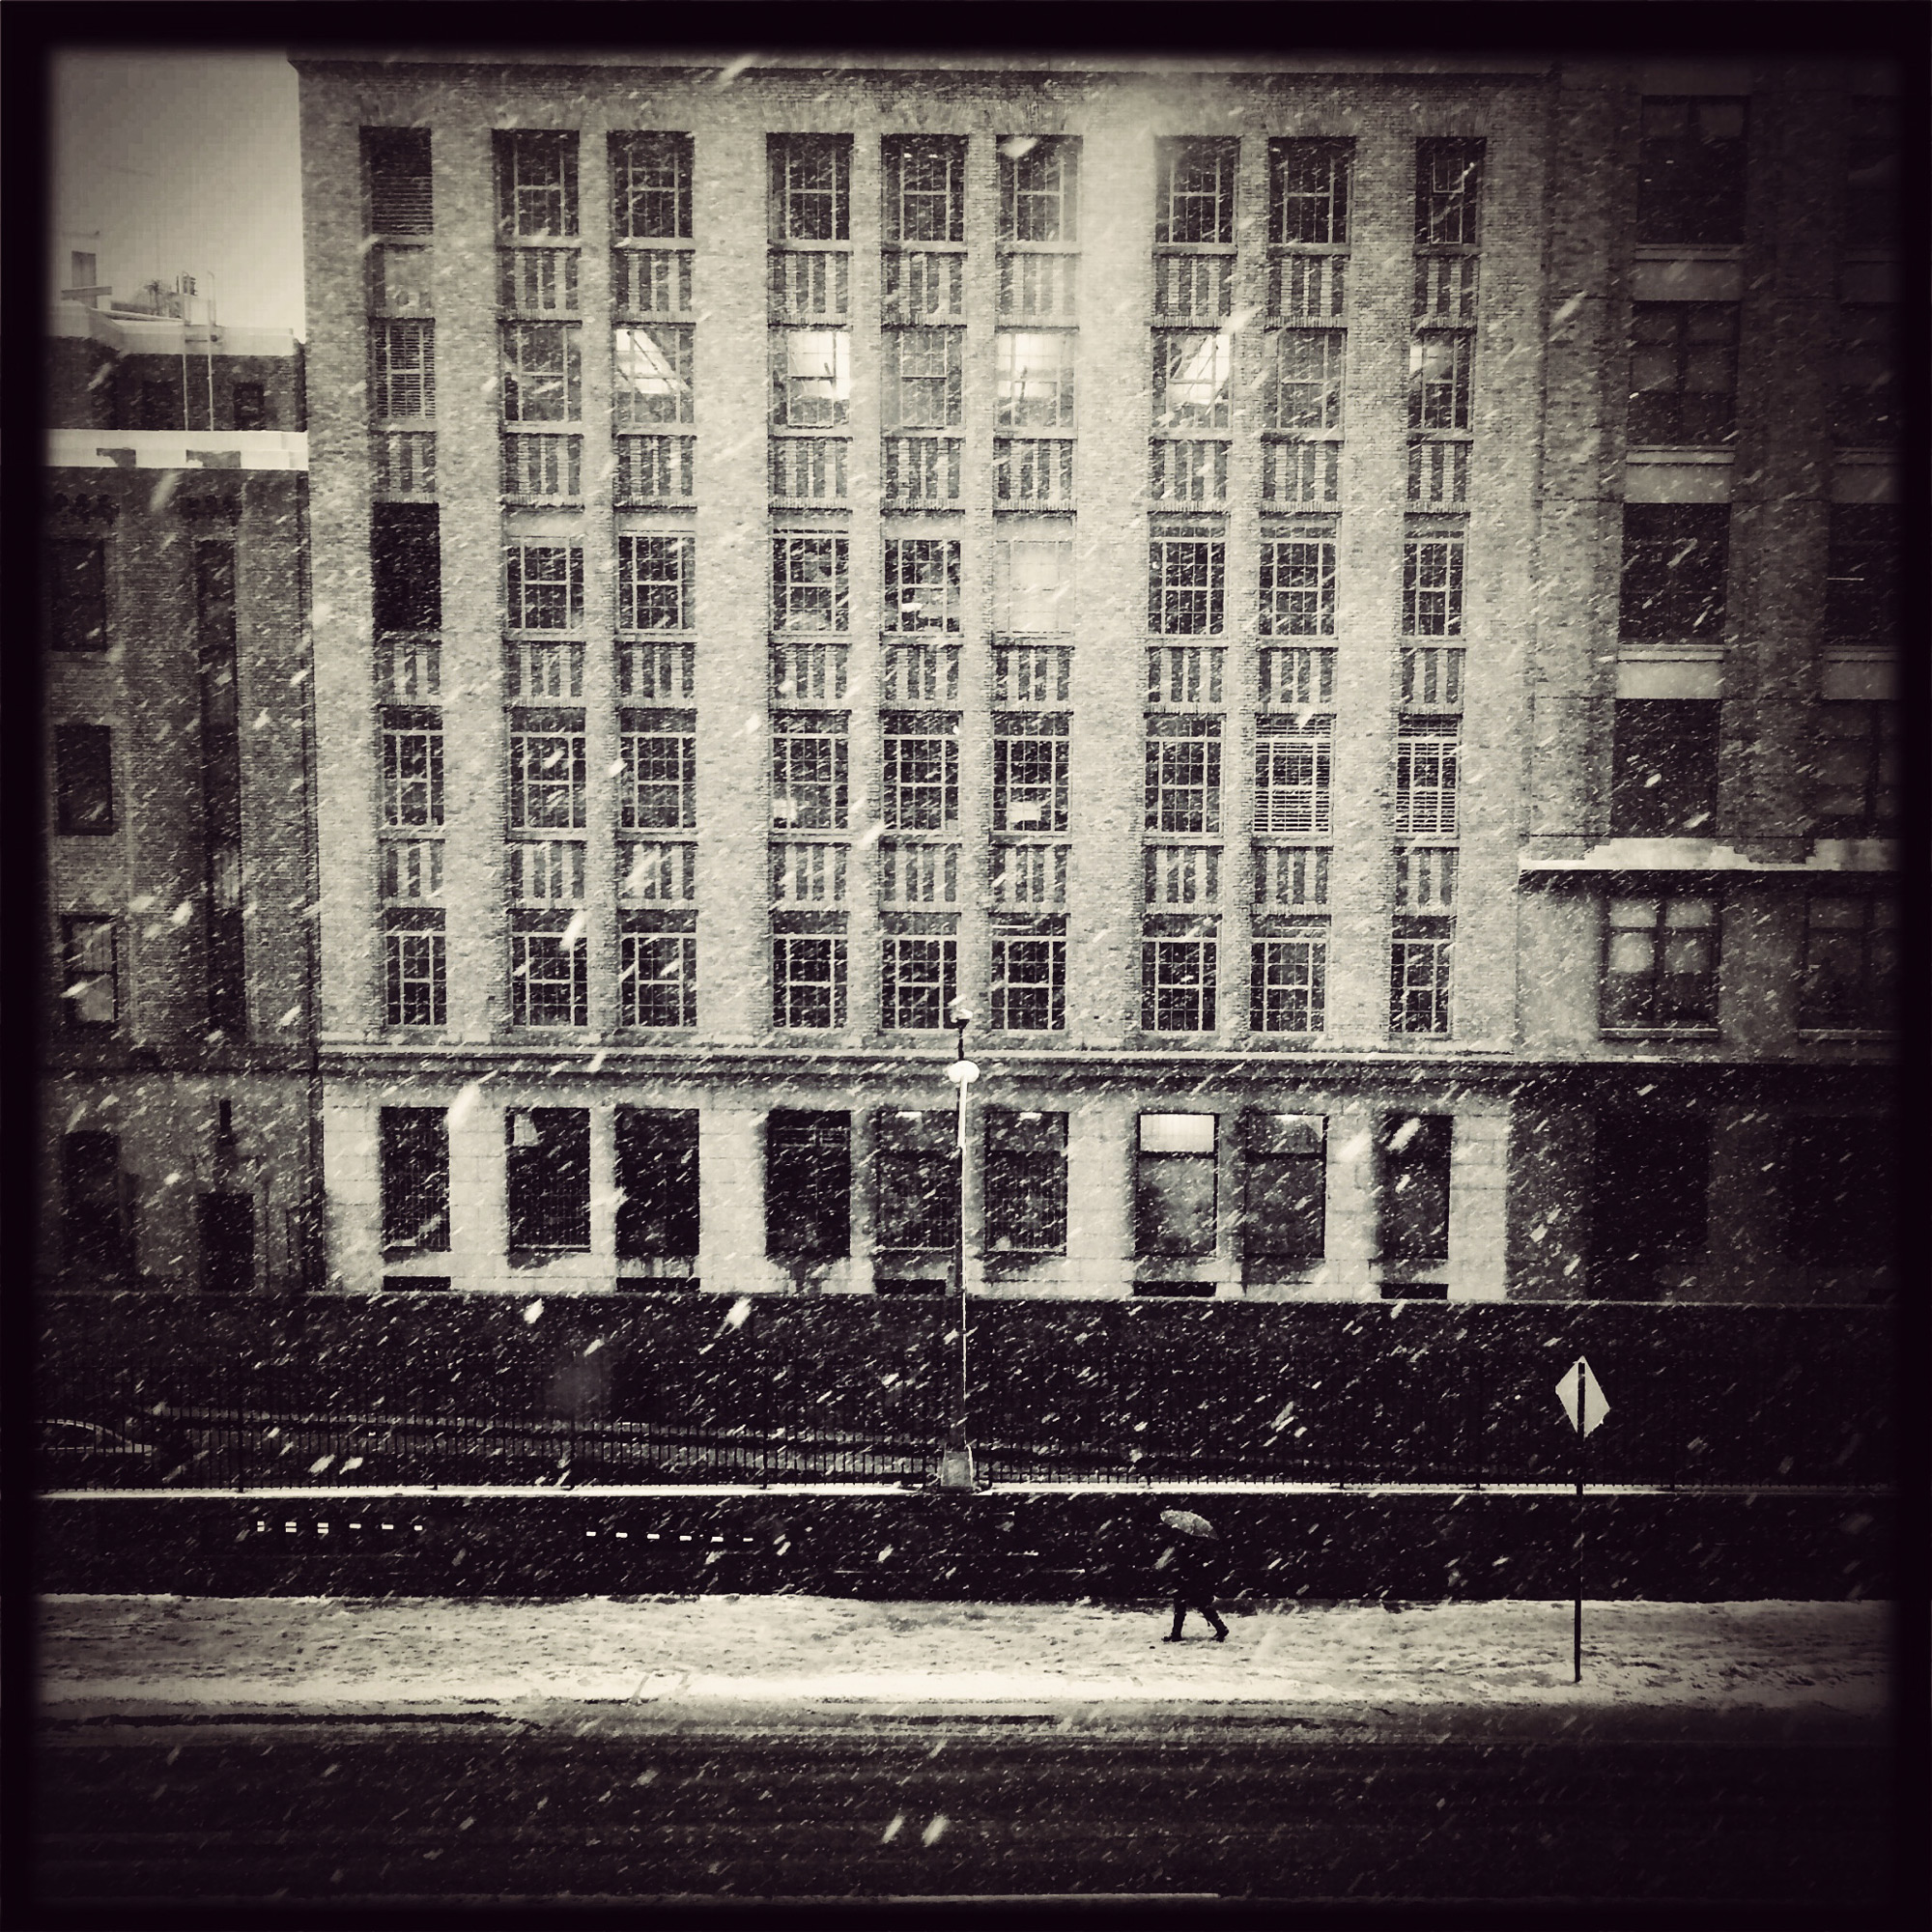 CANALSTREET_SNOW_01_WEB.jpg